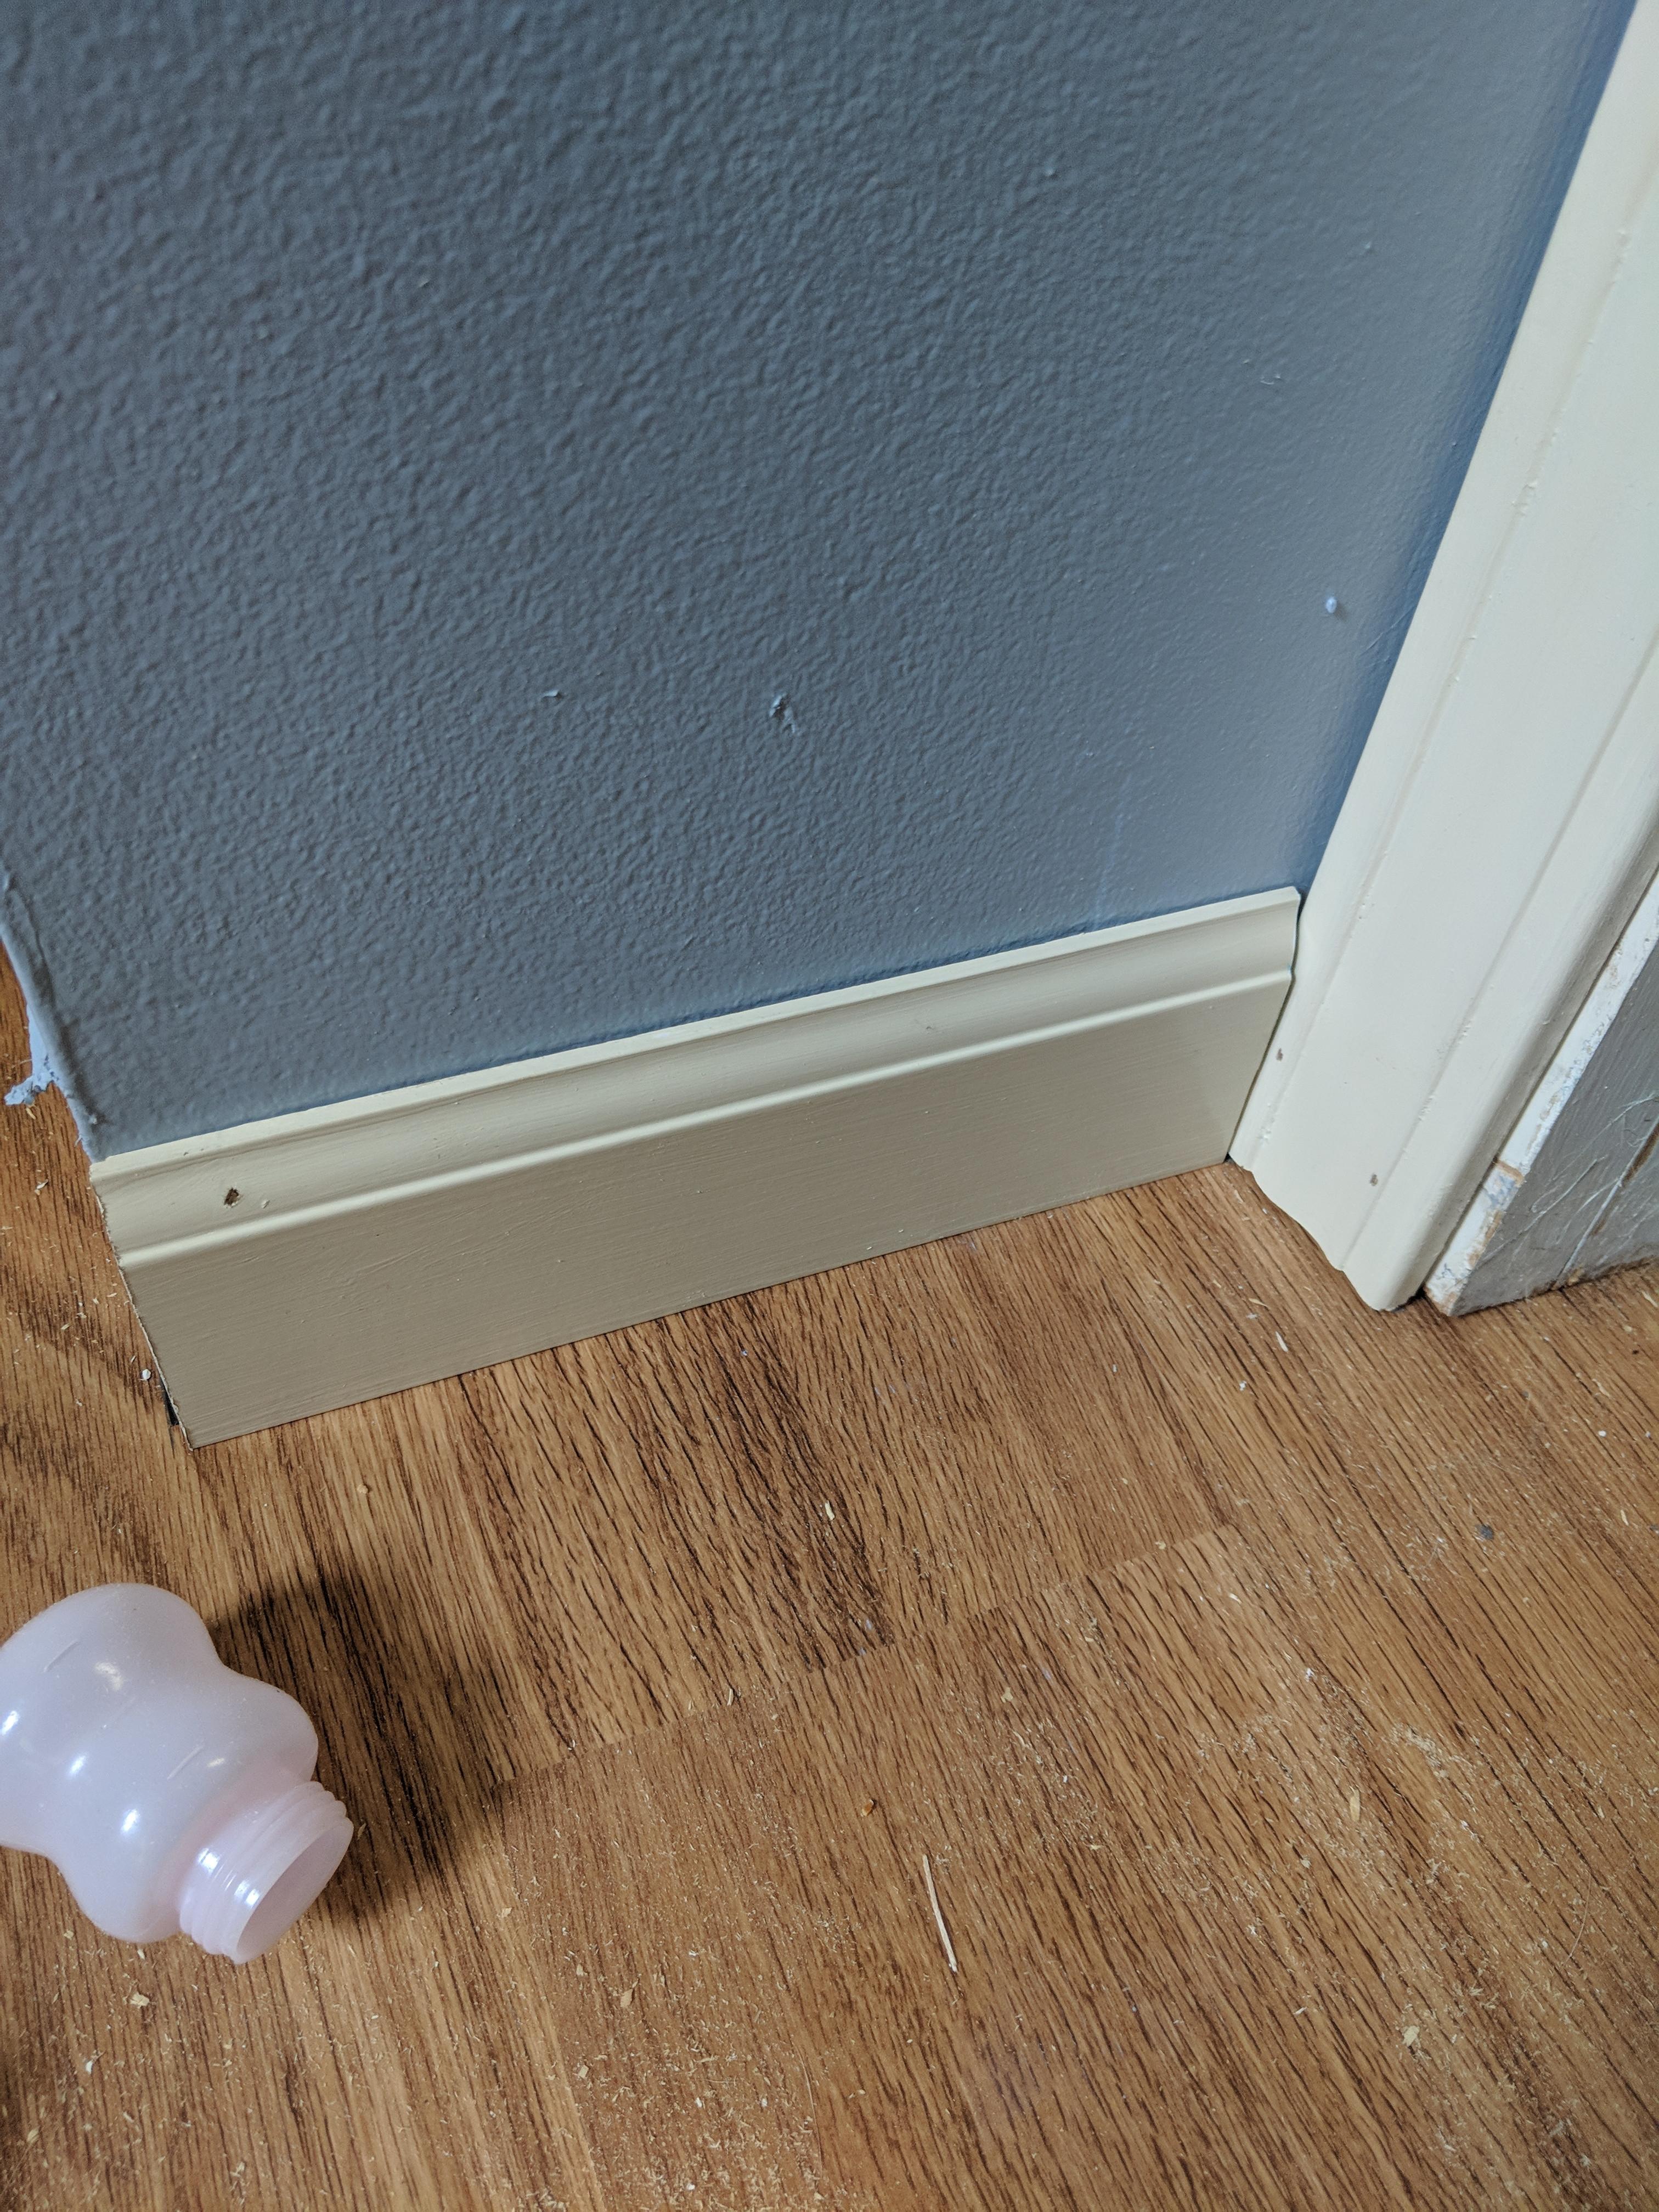 Ss Hardwood Floors Canoga Park Of Https Imgur Com Gallery Kokvx7q Daily Https Imgur Com Kokvx7q Pertaining to Ownhjbq